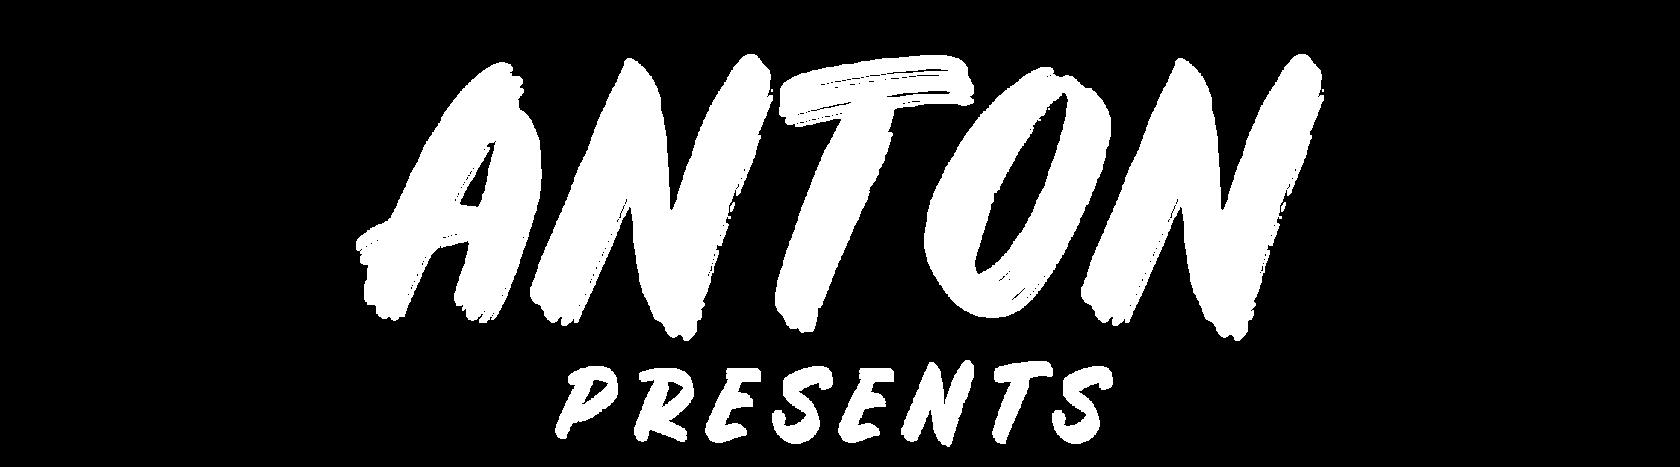 Untitled-1-01